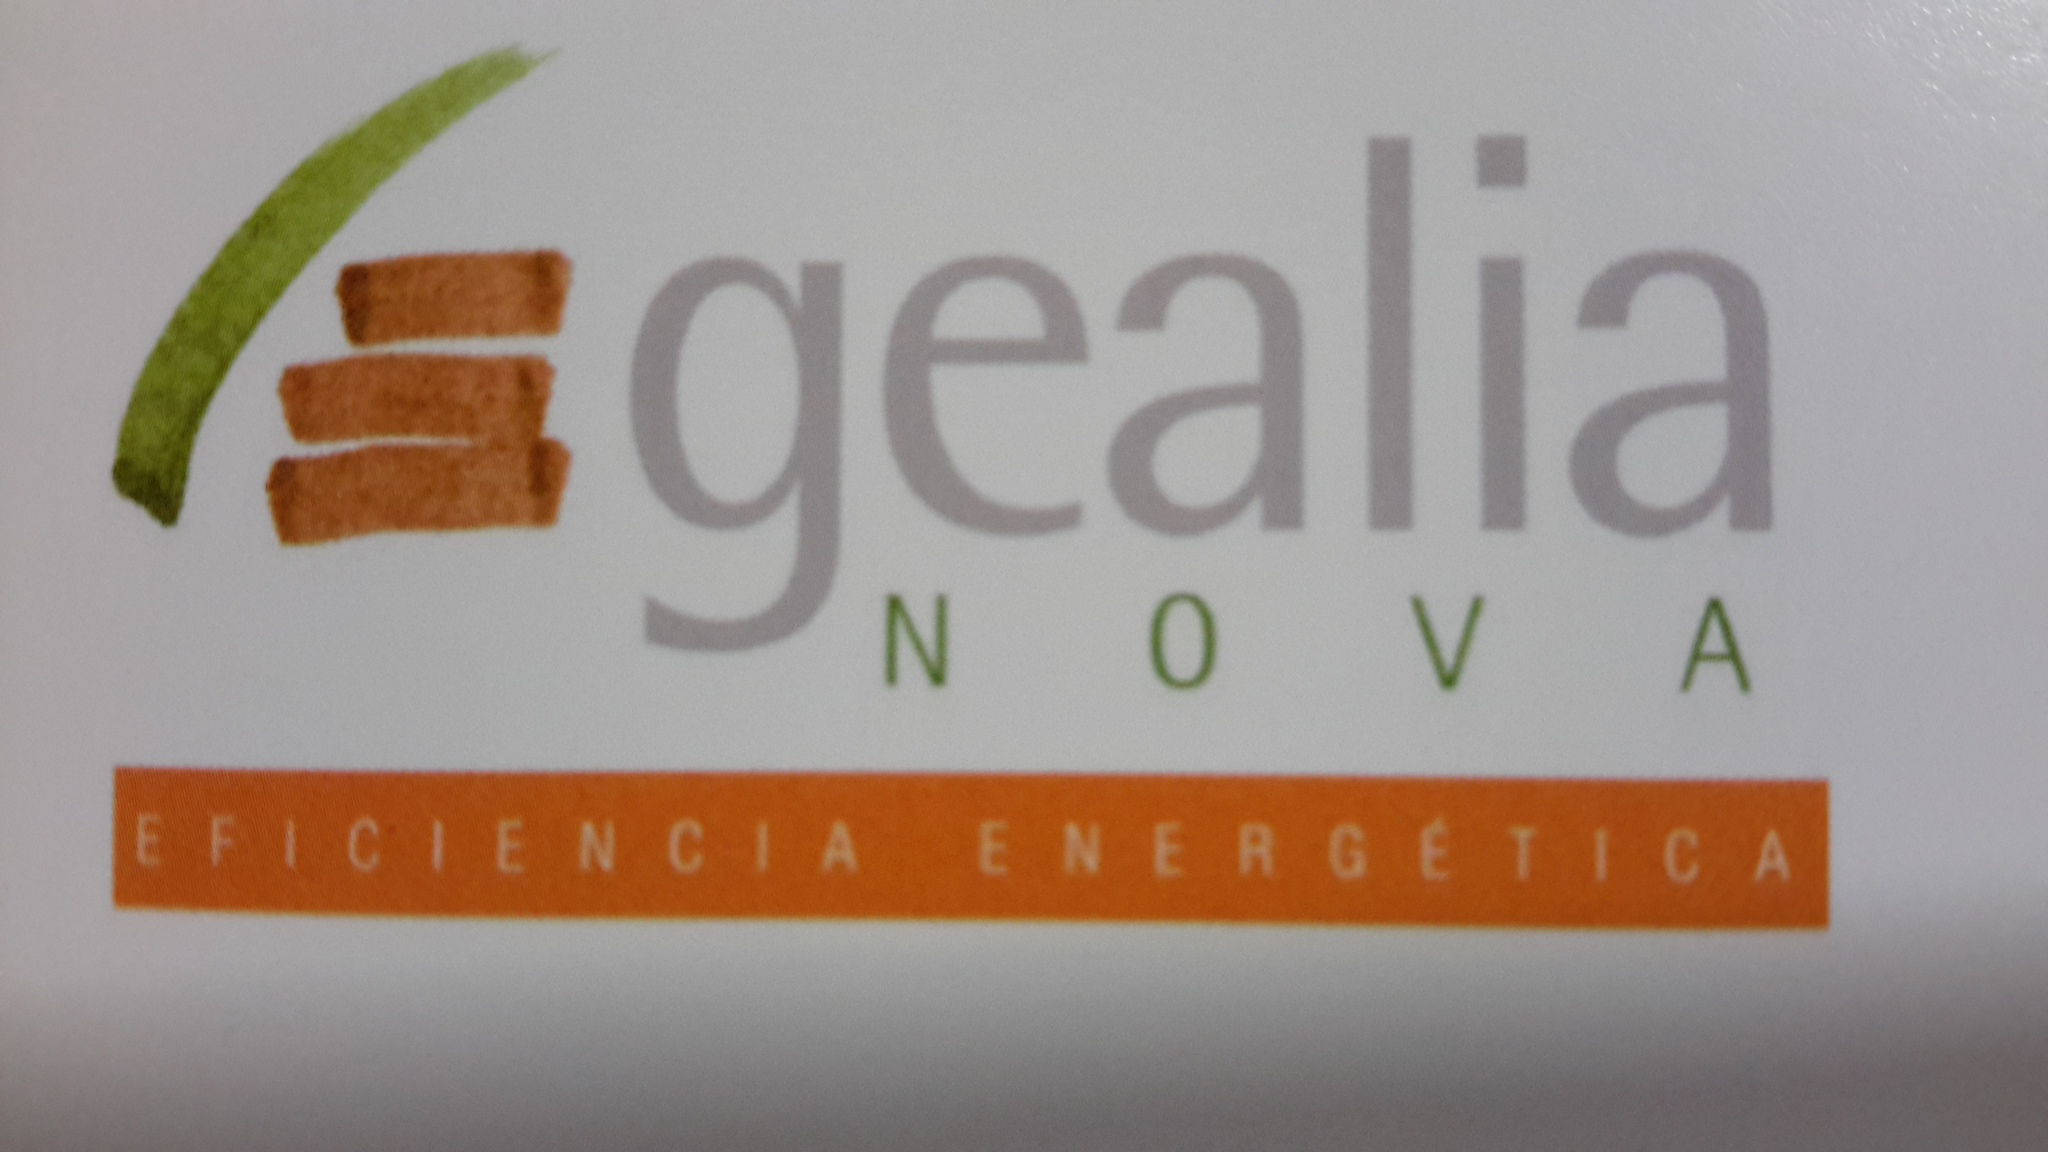 GEALIA NOVA